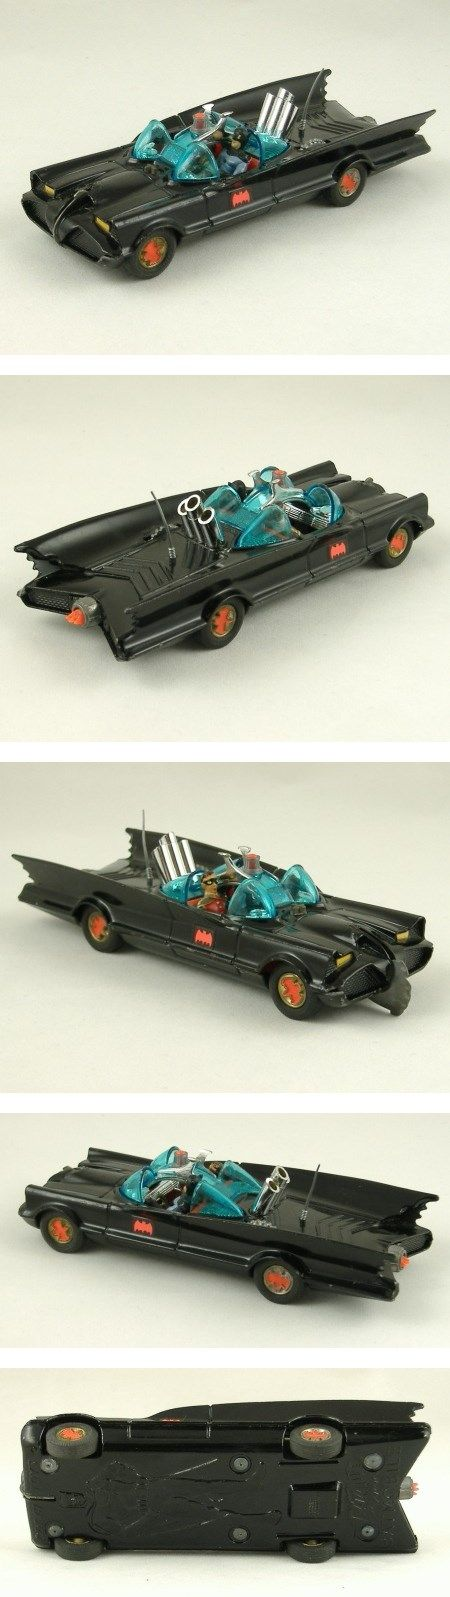 Vintage Corgi Batmobile I still have mine